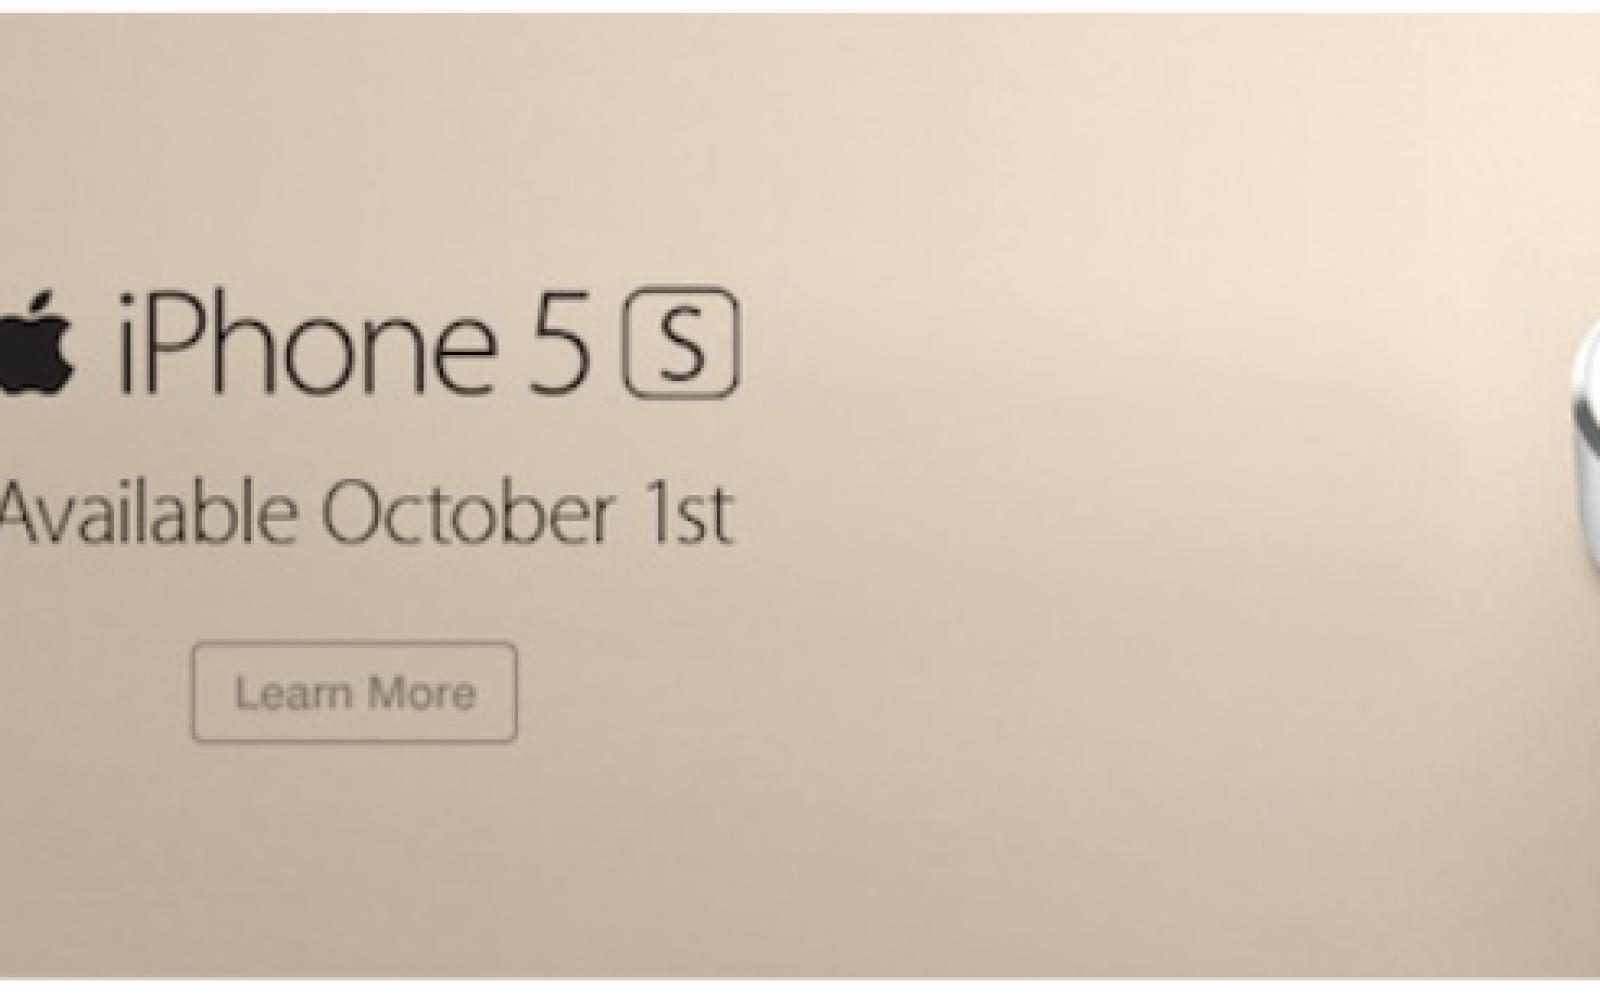 New iPhones hit nine regional U.S. carriers on October 1st